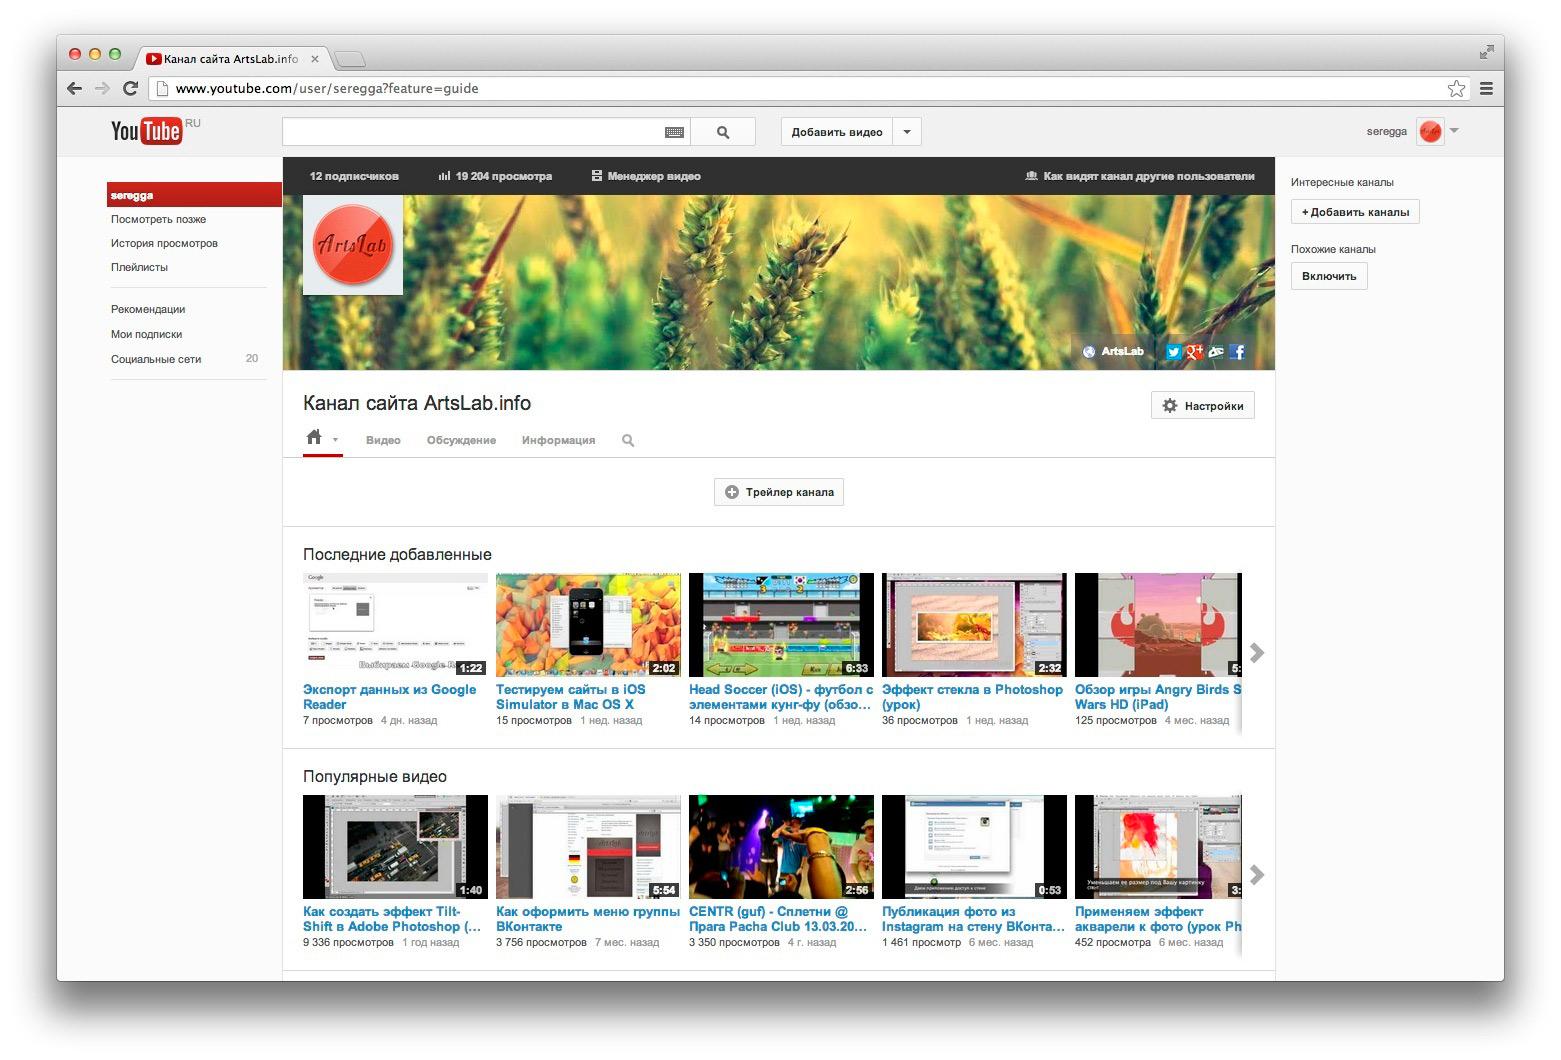 хорошо оформленный канал youtube